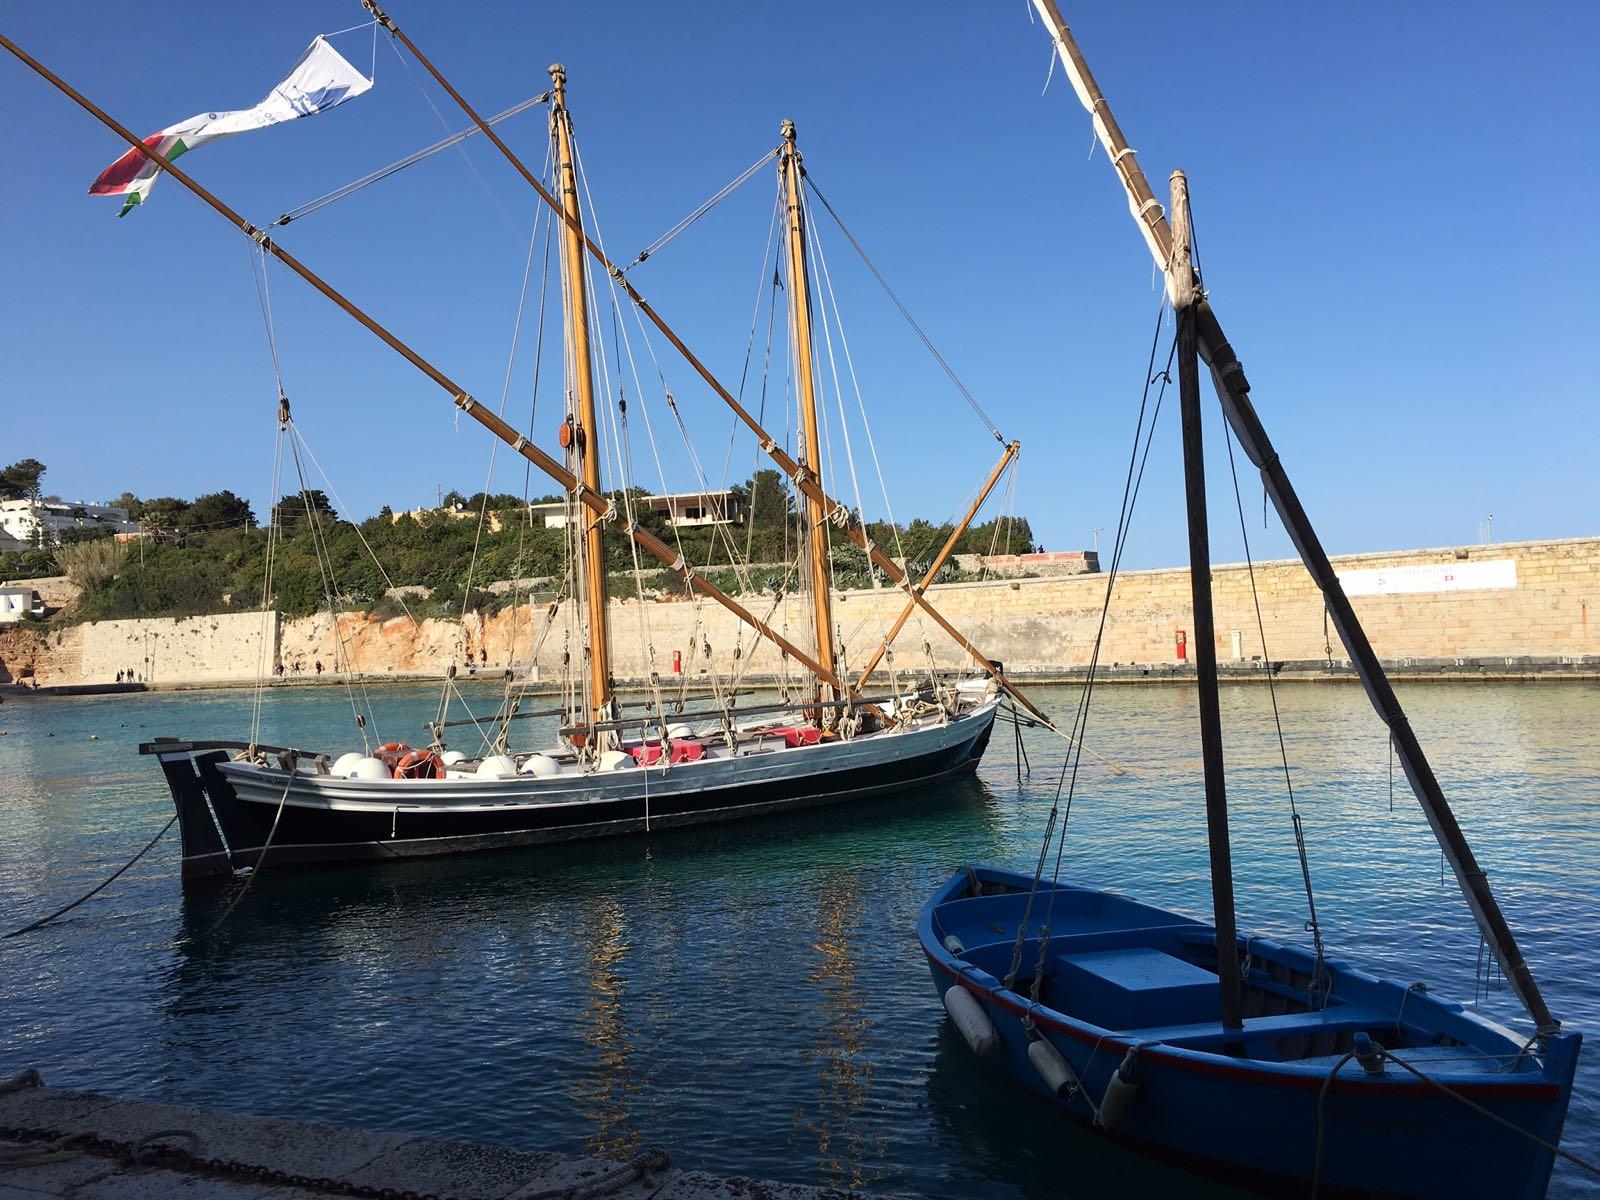 Sud-Est Apulia Salento PugliaSailing